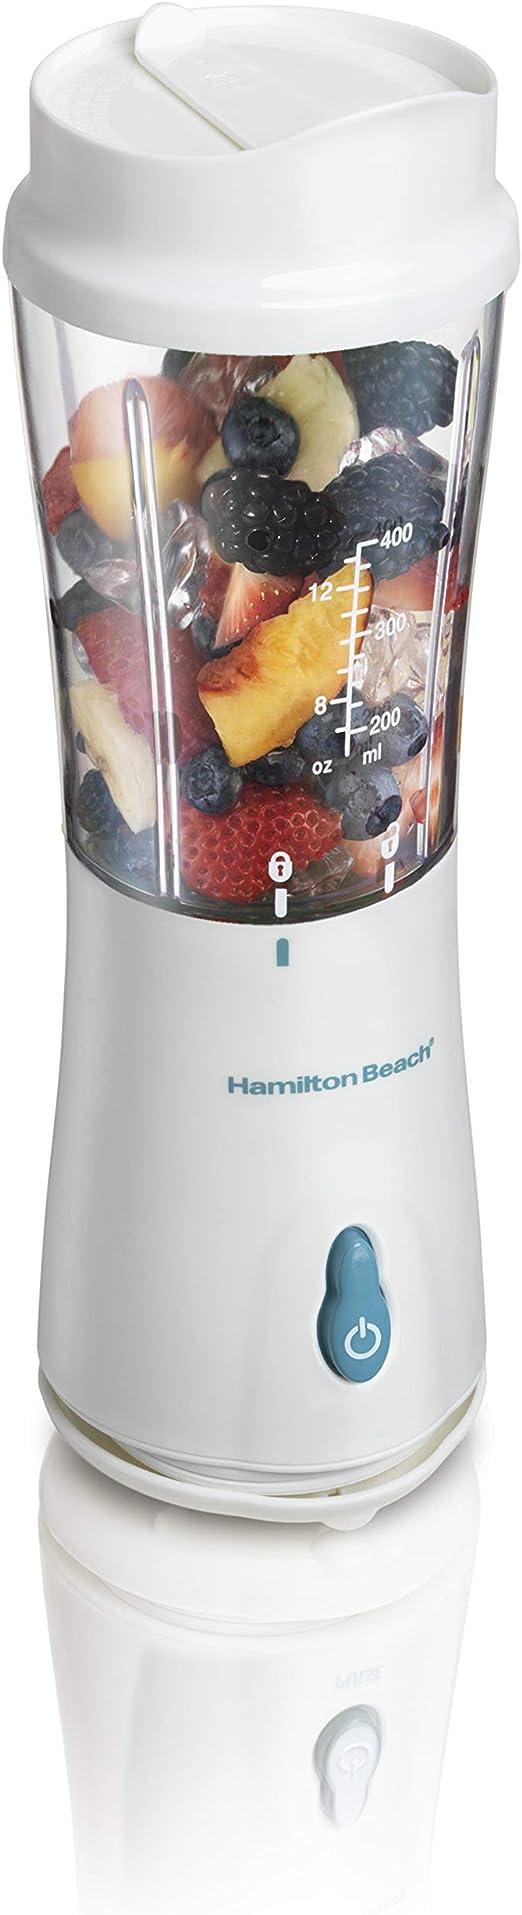 Hamilton Beach 51102 Batidora de vaso Blanco - Licuadora (Batidora ...